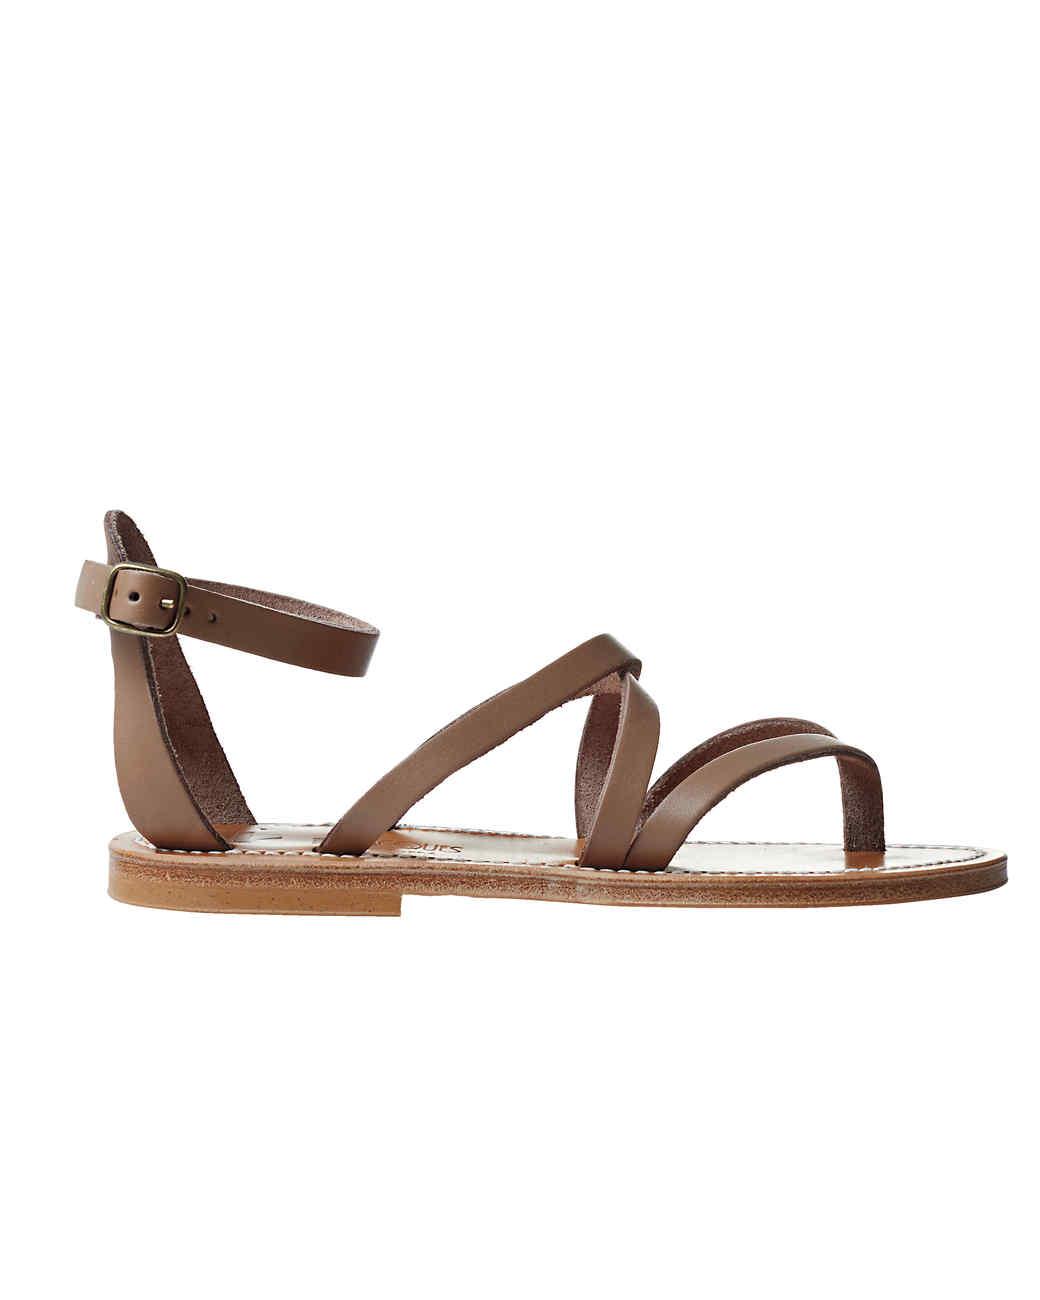 sandal-mld110945.jpg